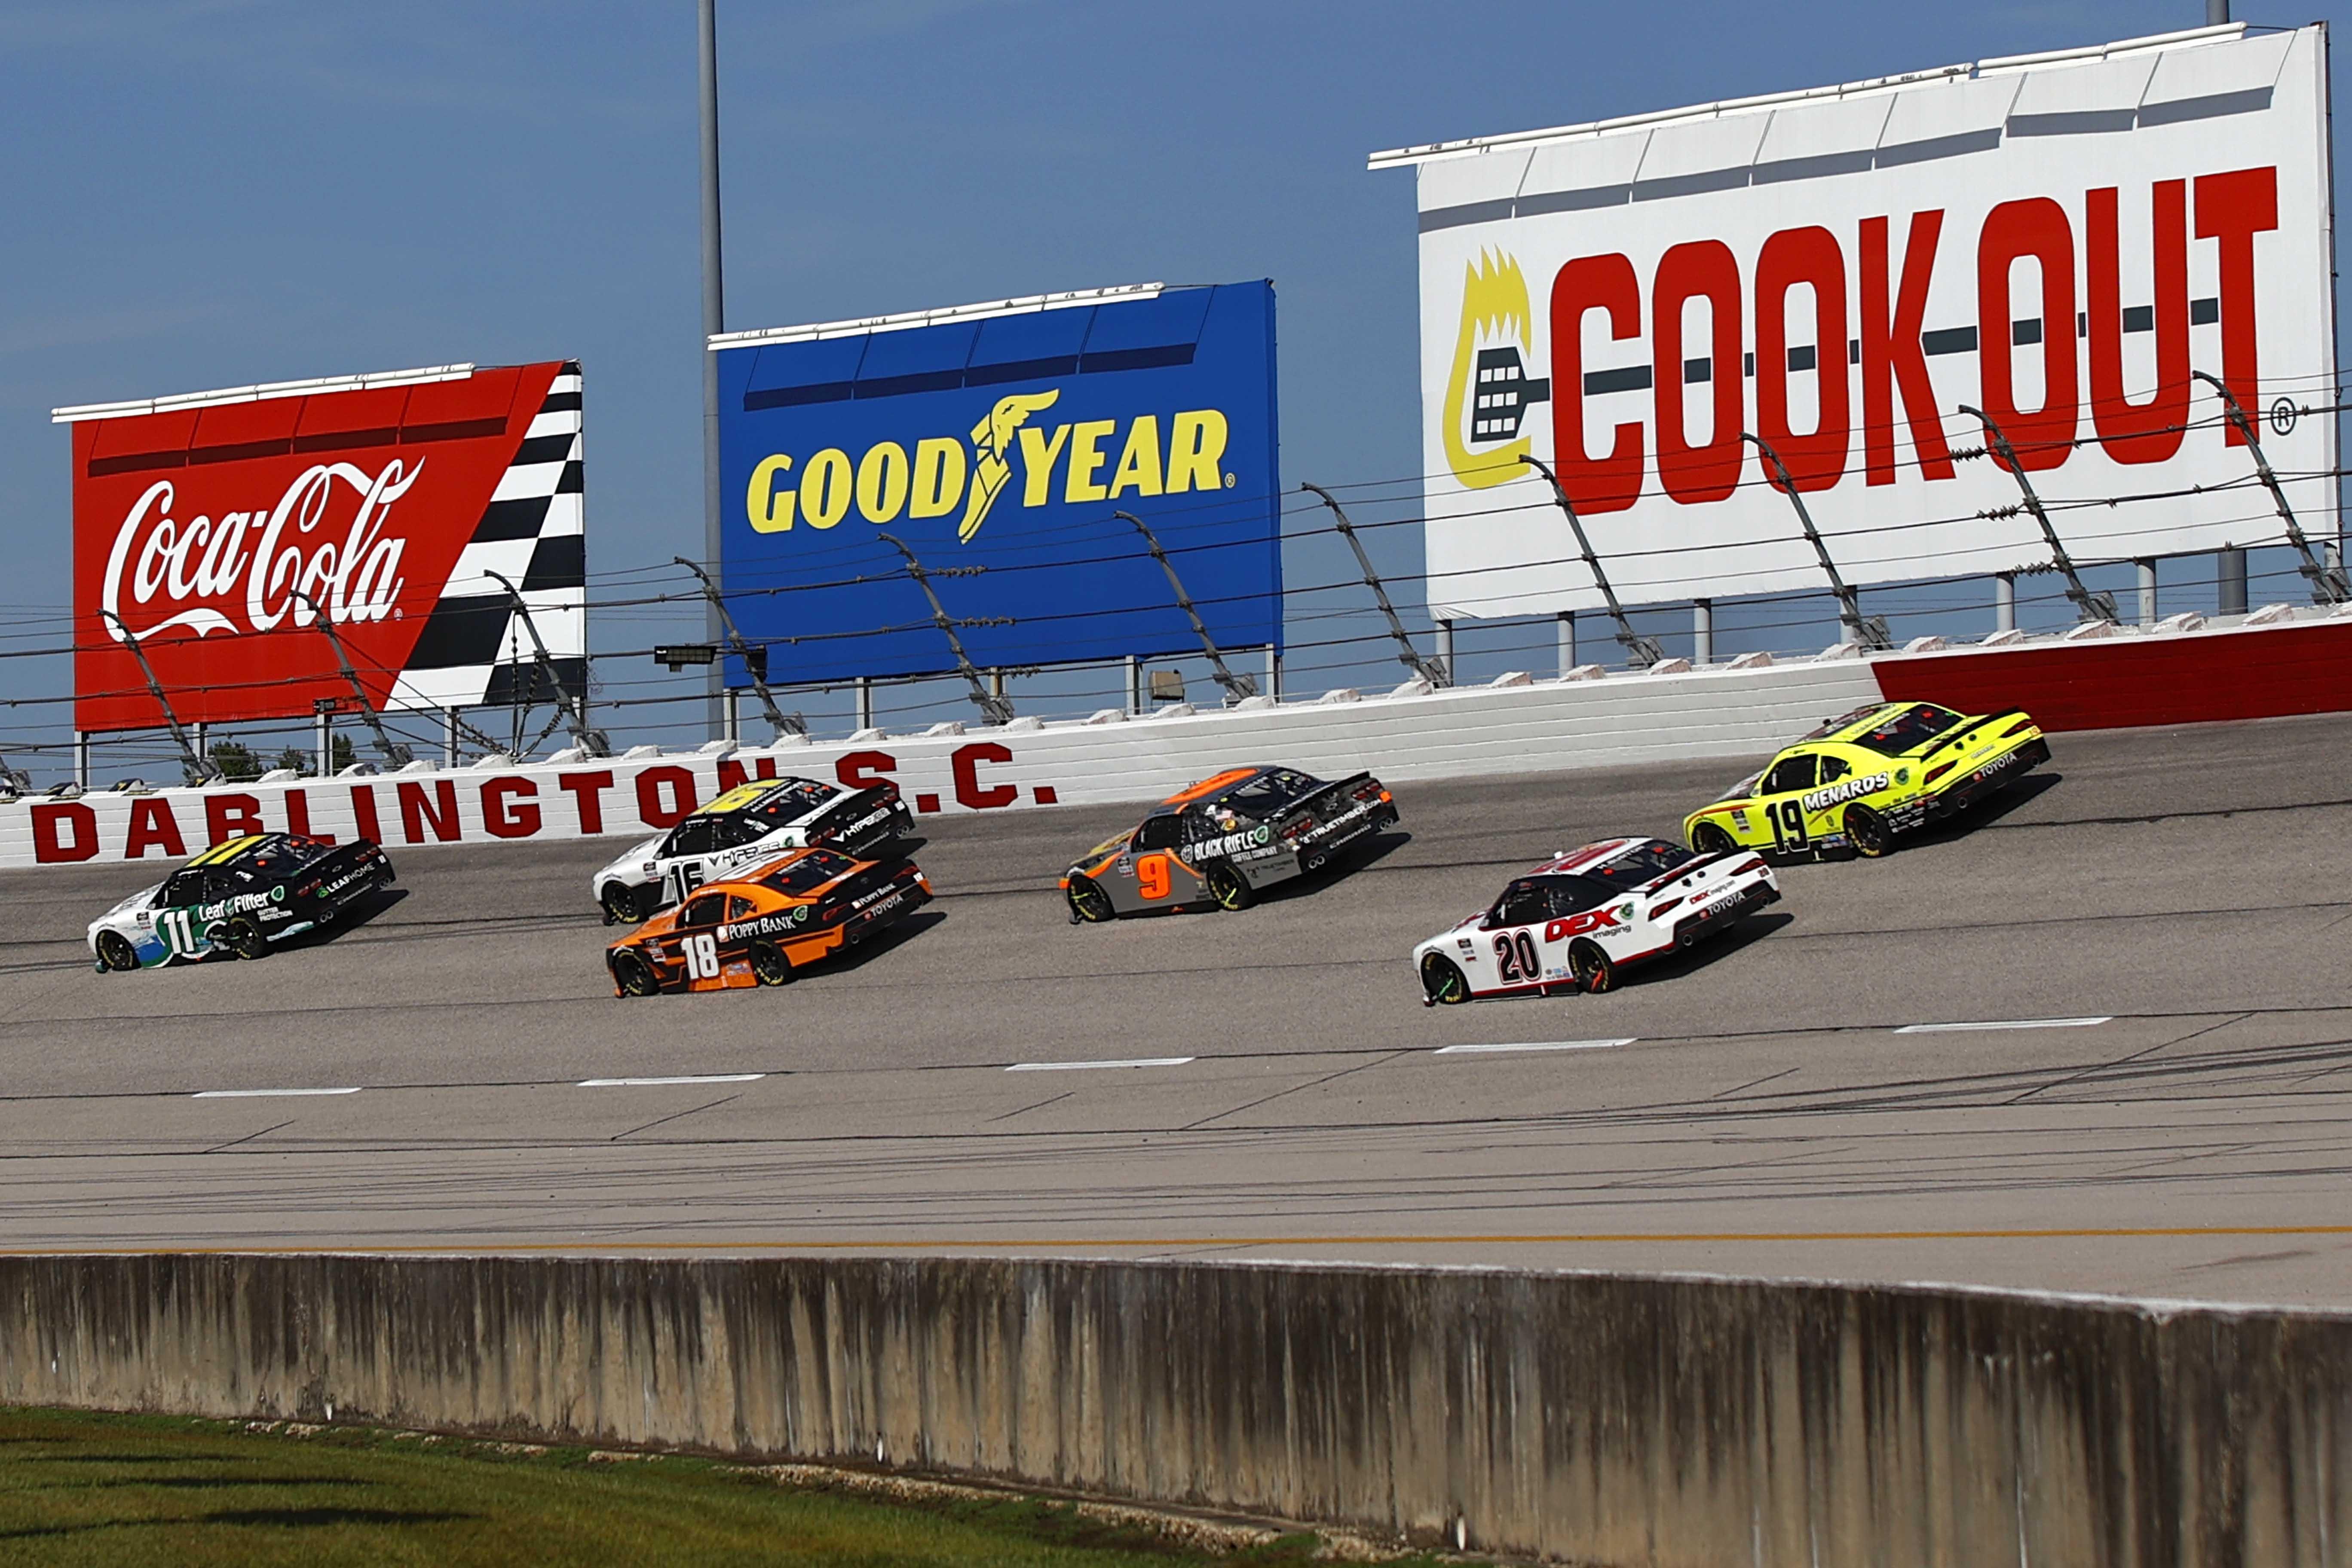 Justin Haley, AJ Allmendinger, Daniel Hemric, Noah Gragson - NASCAR Xfinity Series - Darlington Raceway